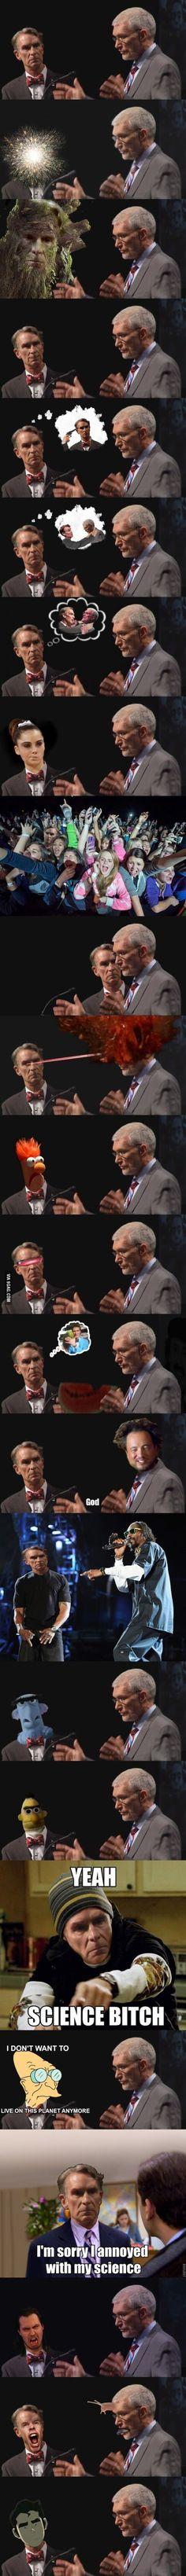 Billl Nye : Faced